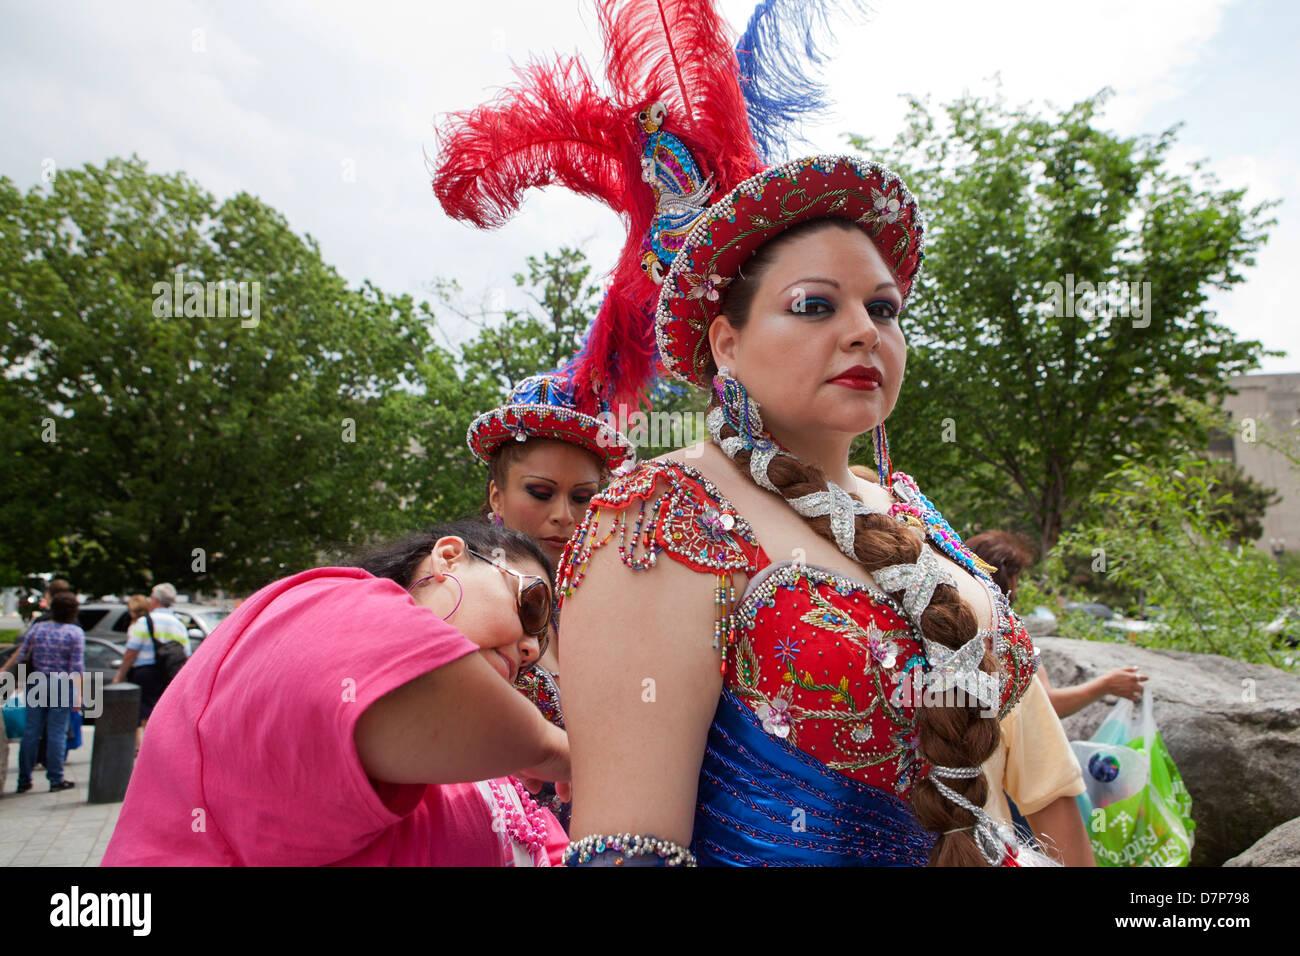 Traditional female Bolivian dancer at Latin festival - Washington, DC USA - Stock Image